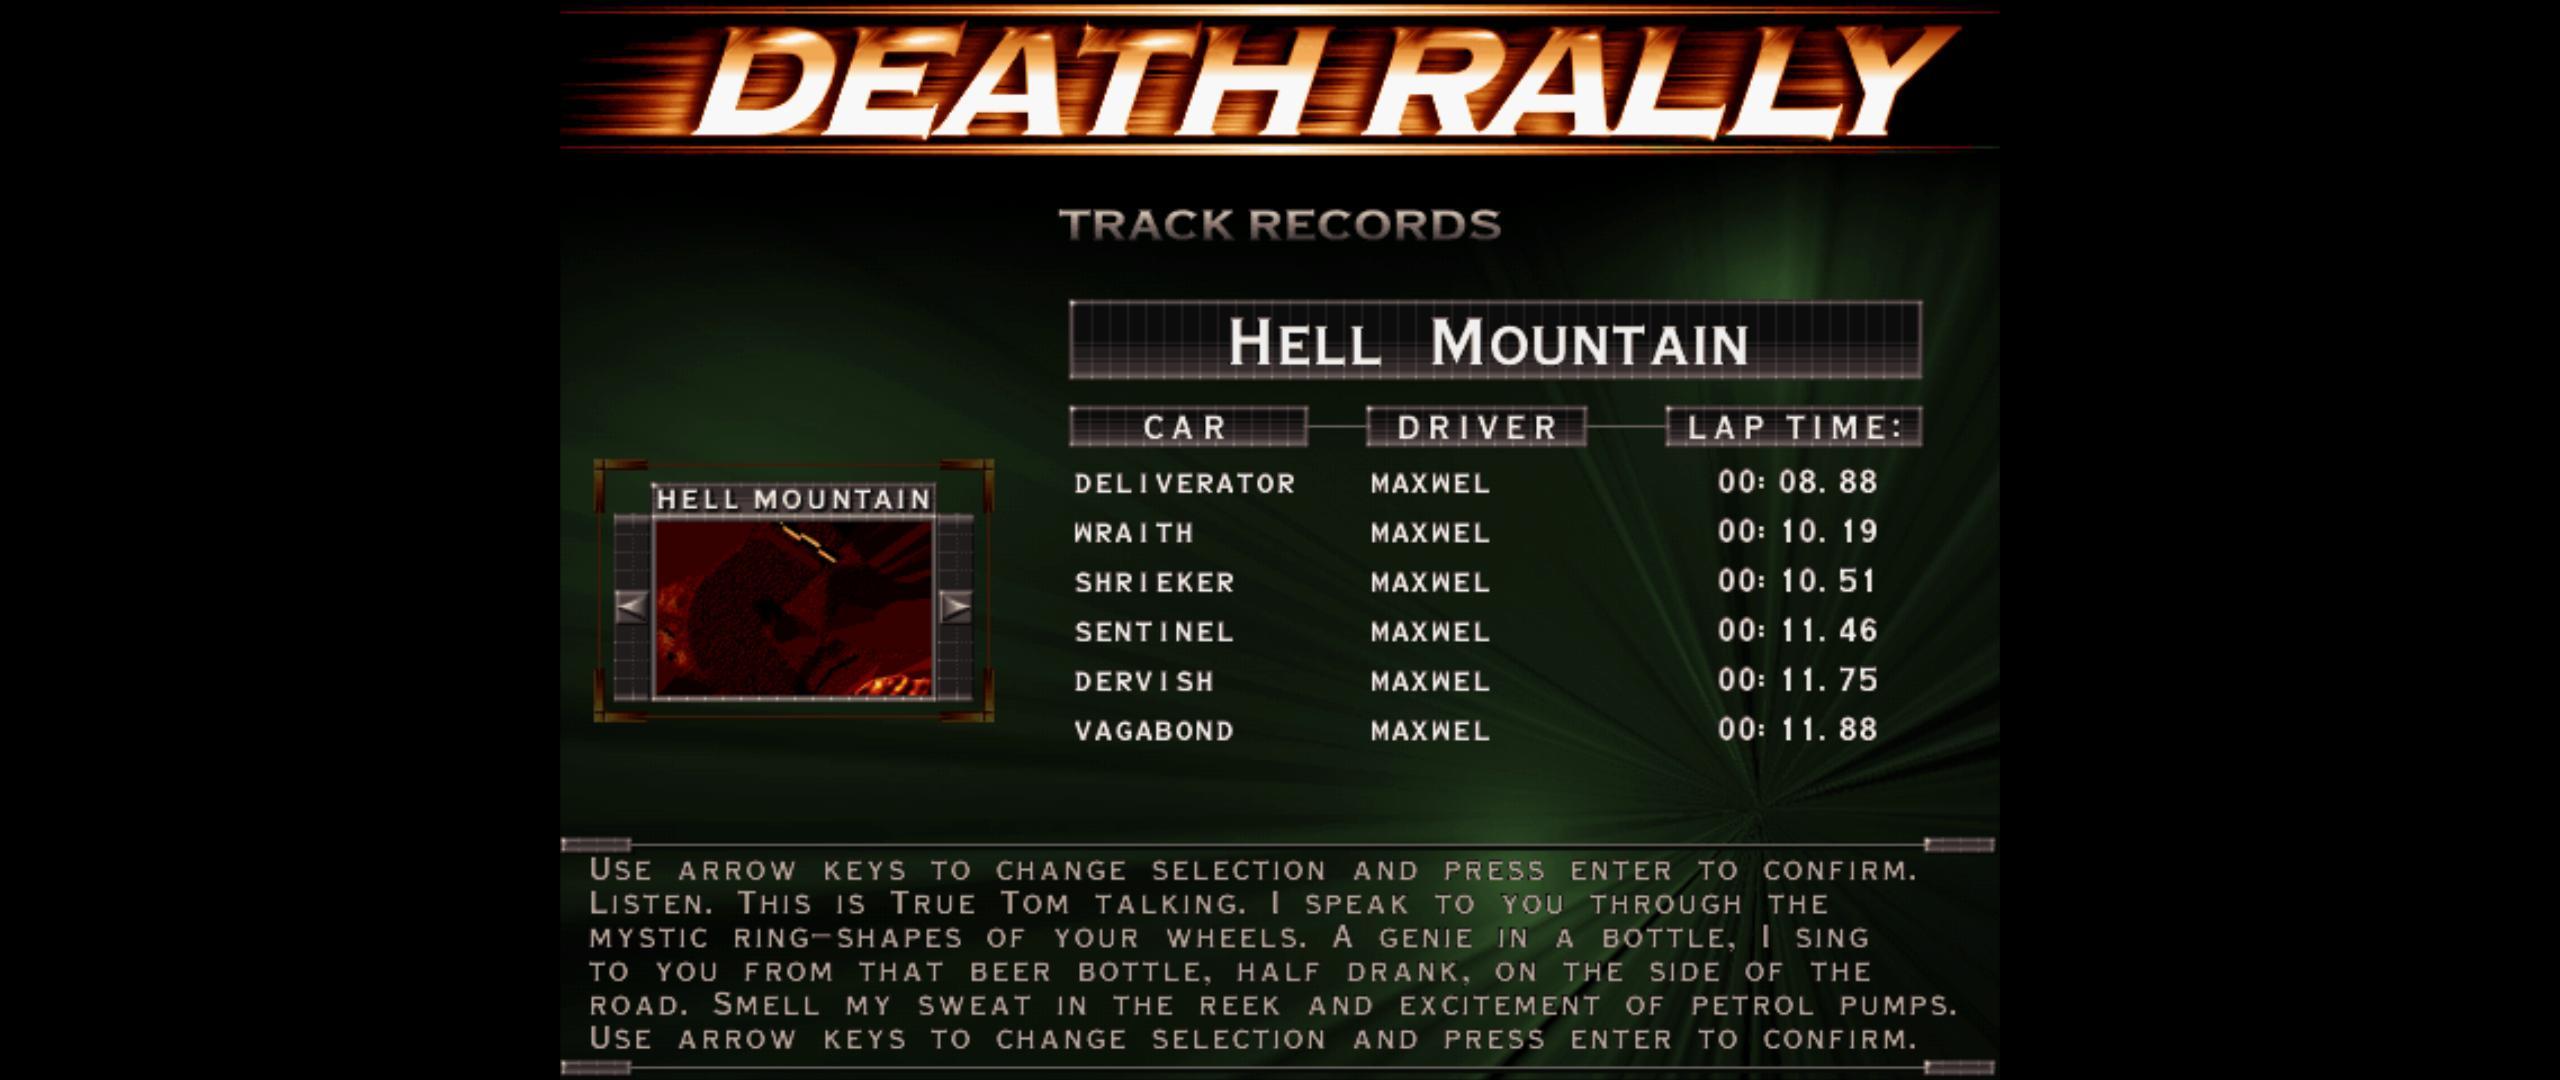 Maxwel: Death Rally [Hell Mountain, Vagabond Car] (PC) 0:00:11.88 points on 2016-03-04 06:48:44